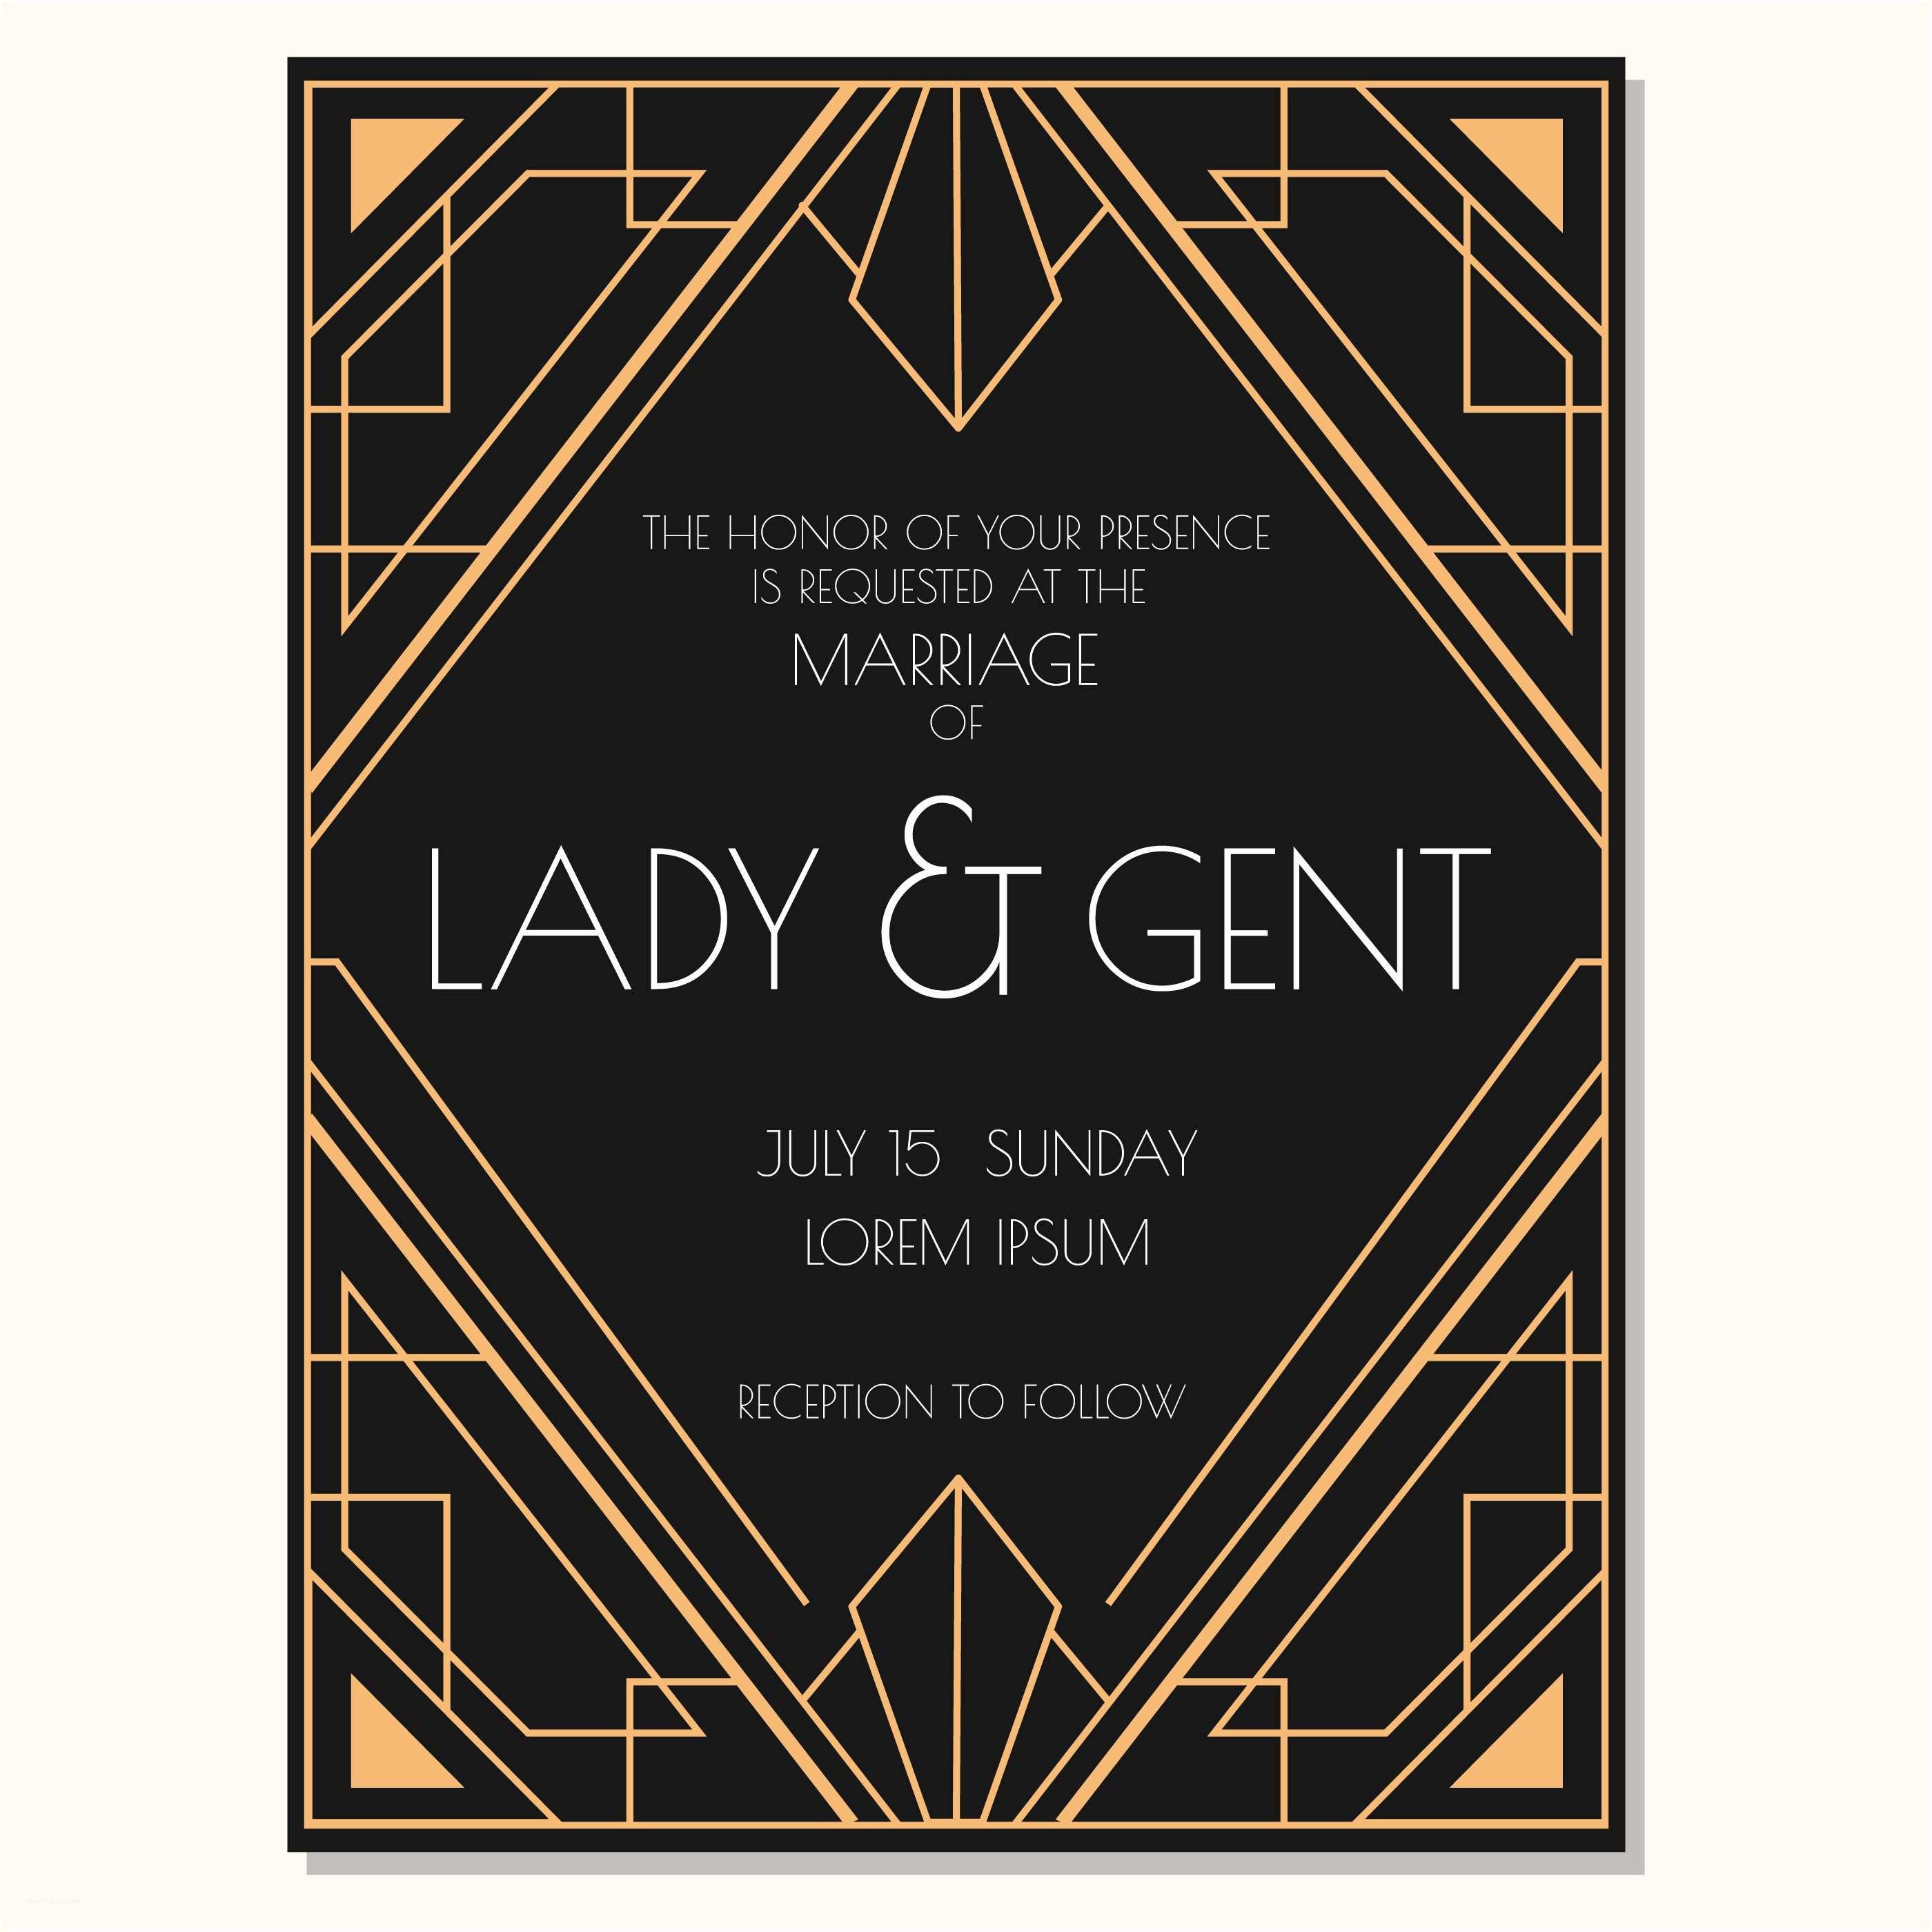 Art Deco Wedding Invitations Free Download Classic Art Deco Wedding Invitation Vector Download Free